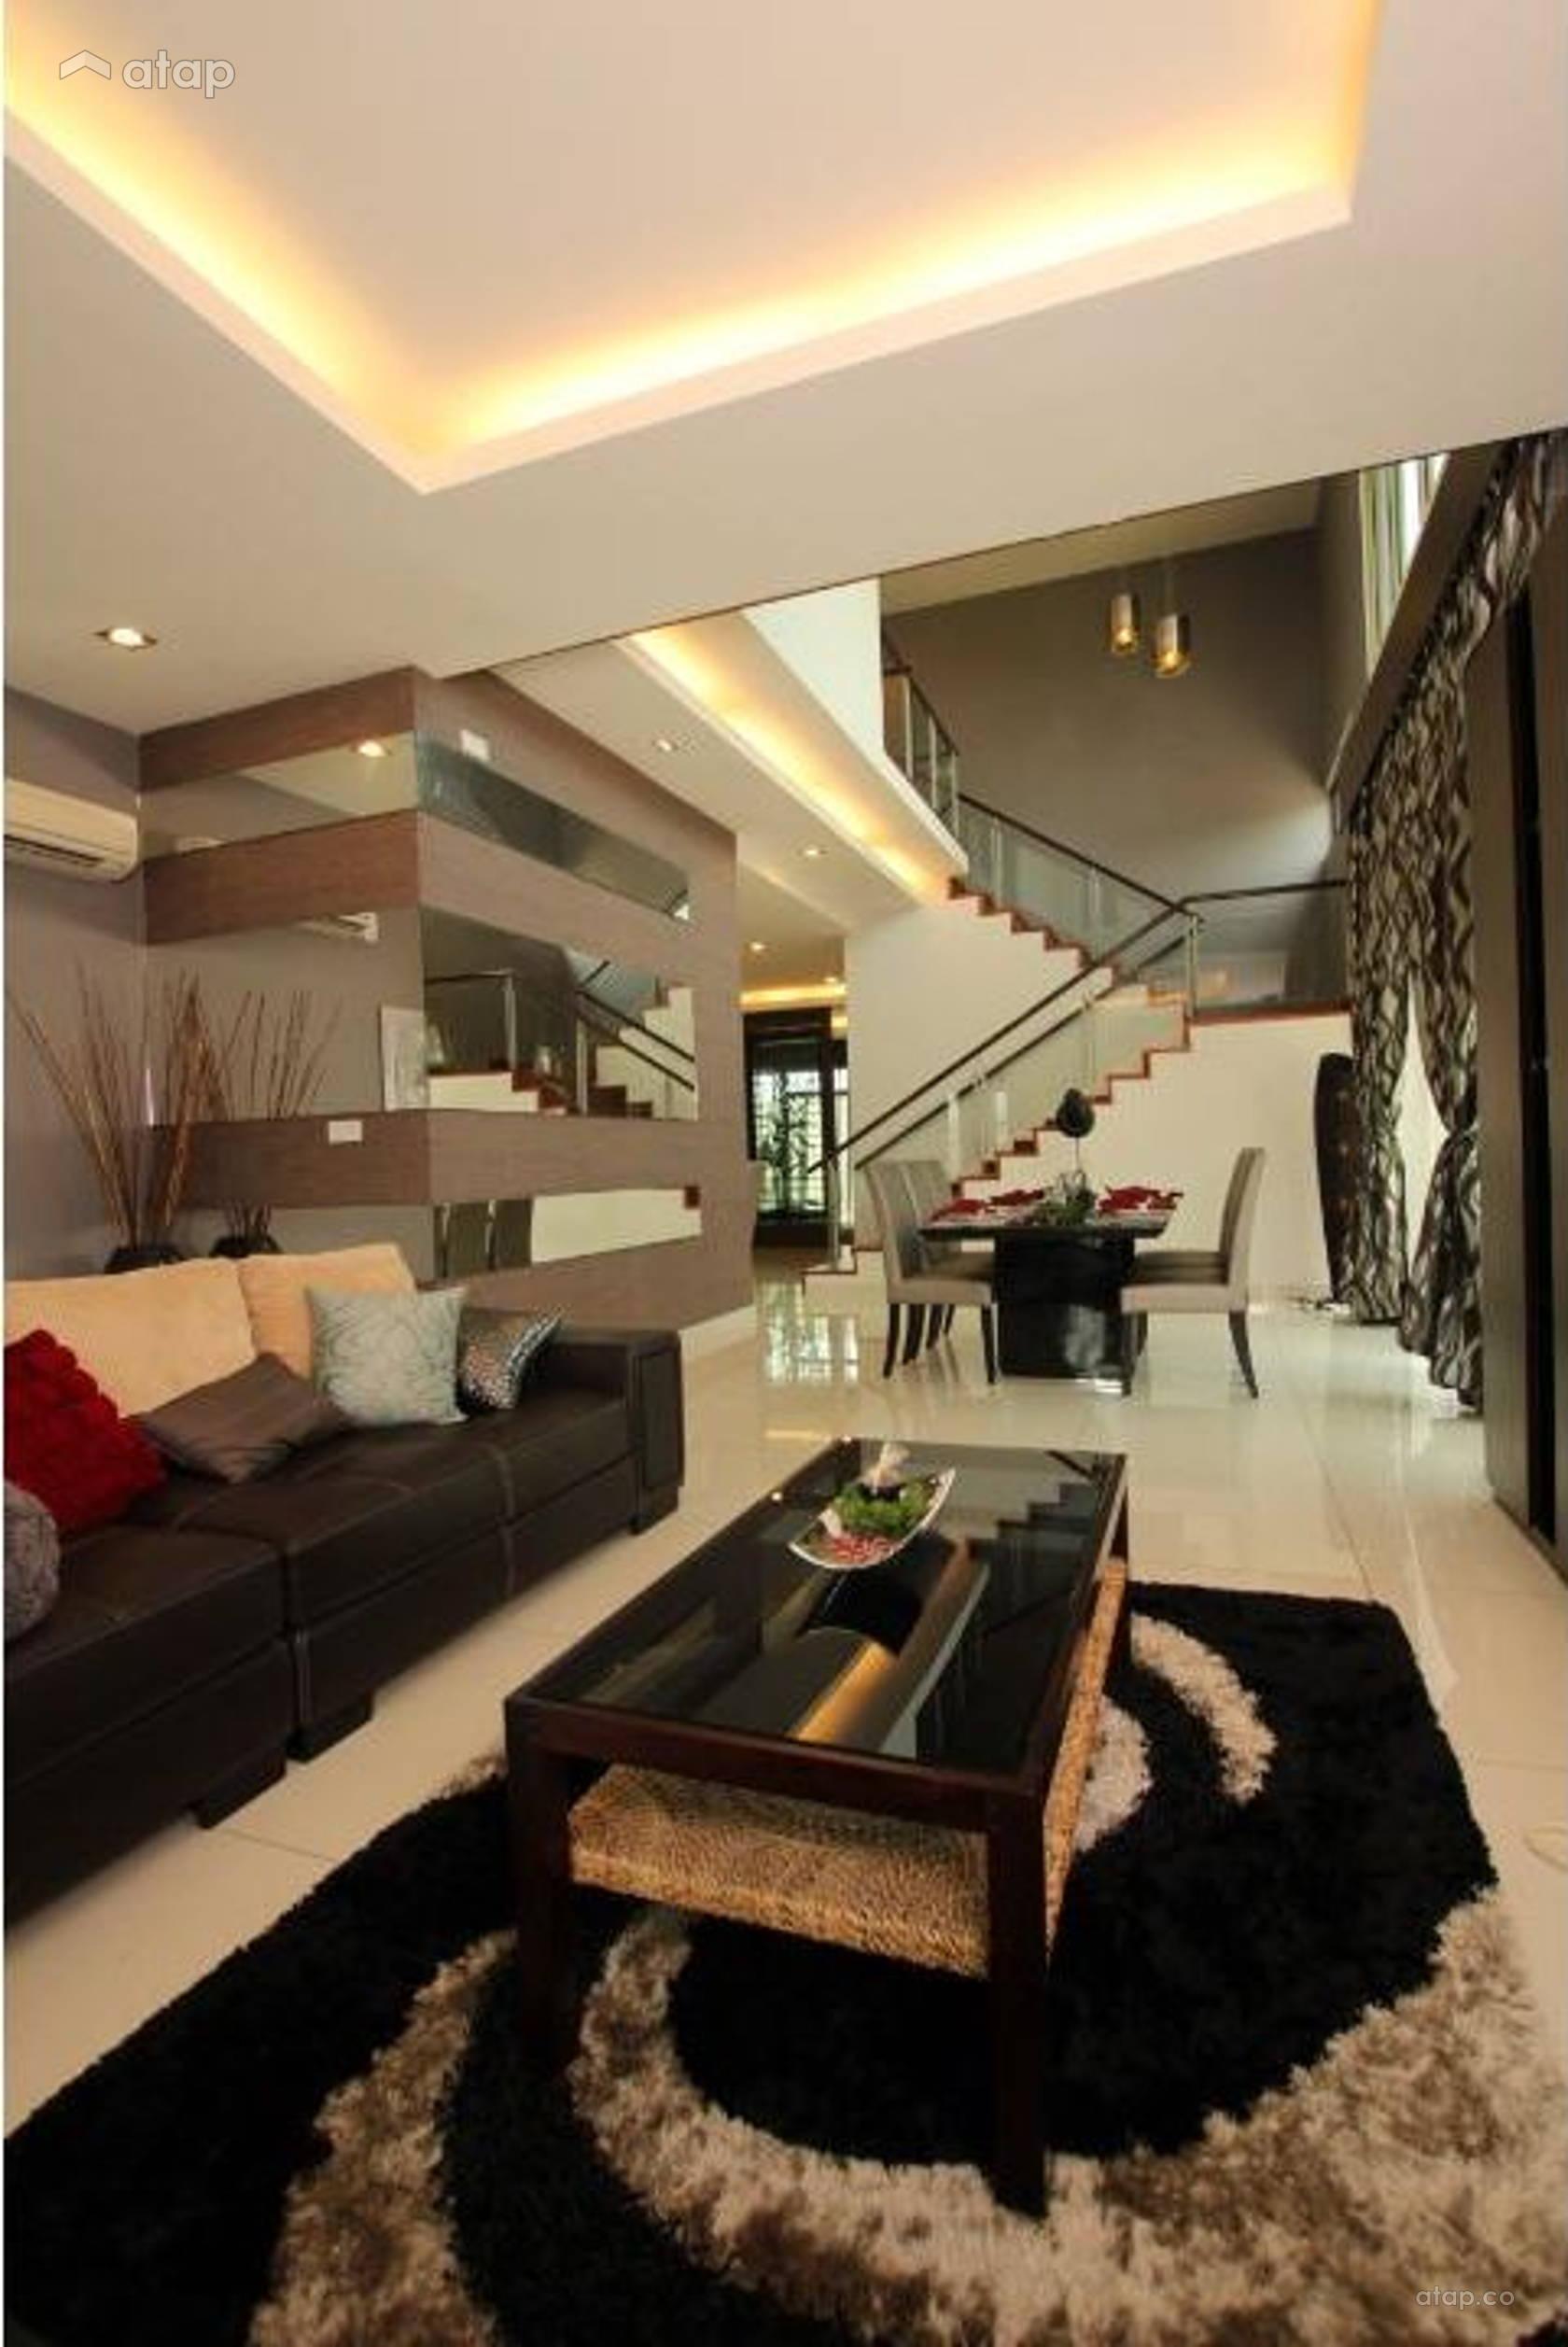 seri austin show house a interior design renovation ideas photos